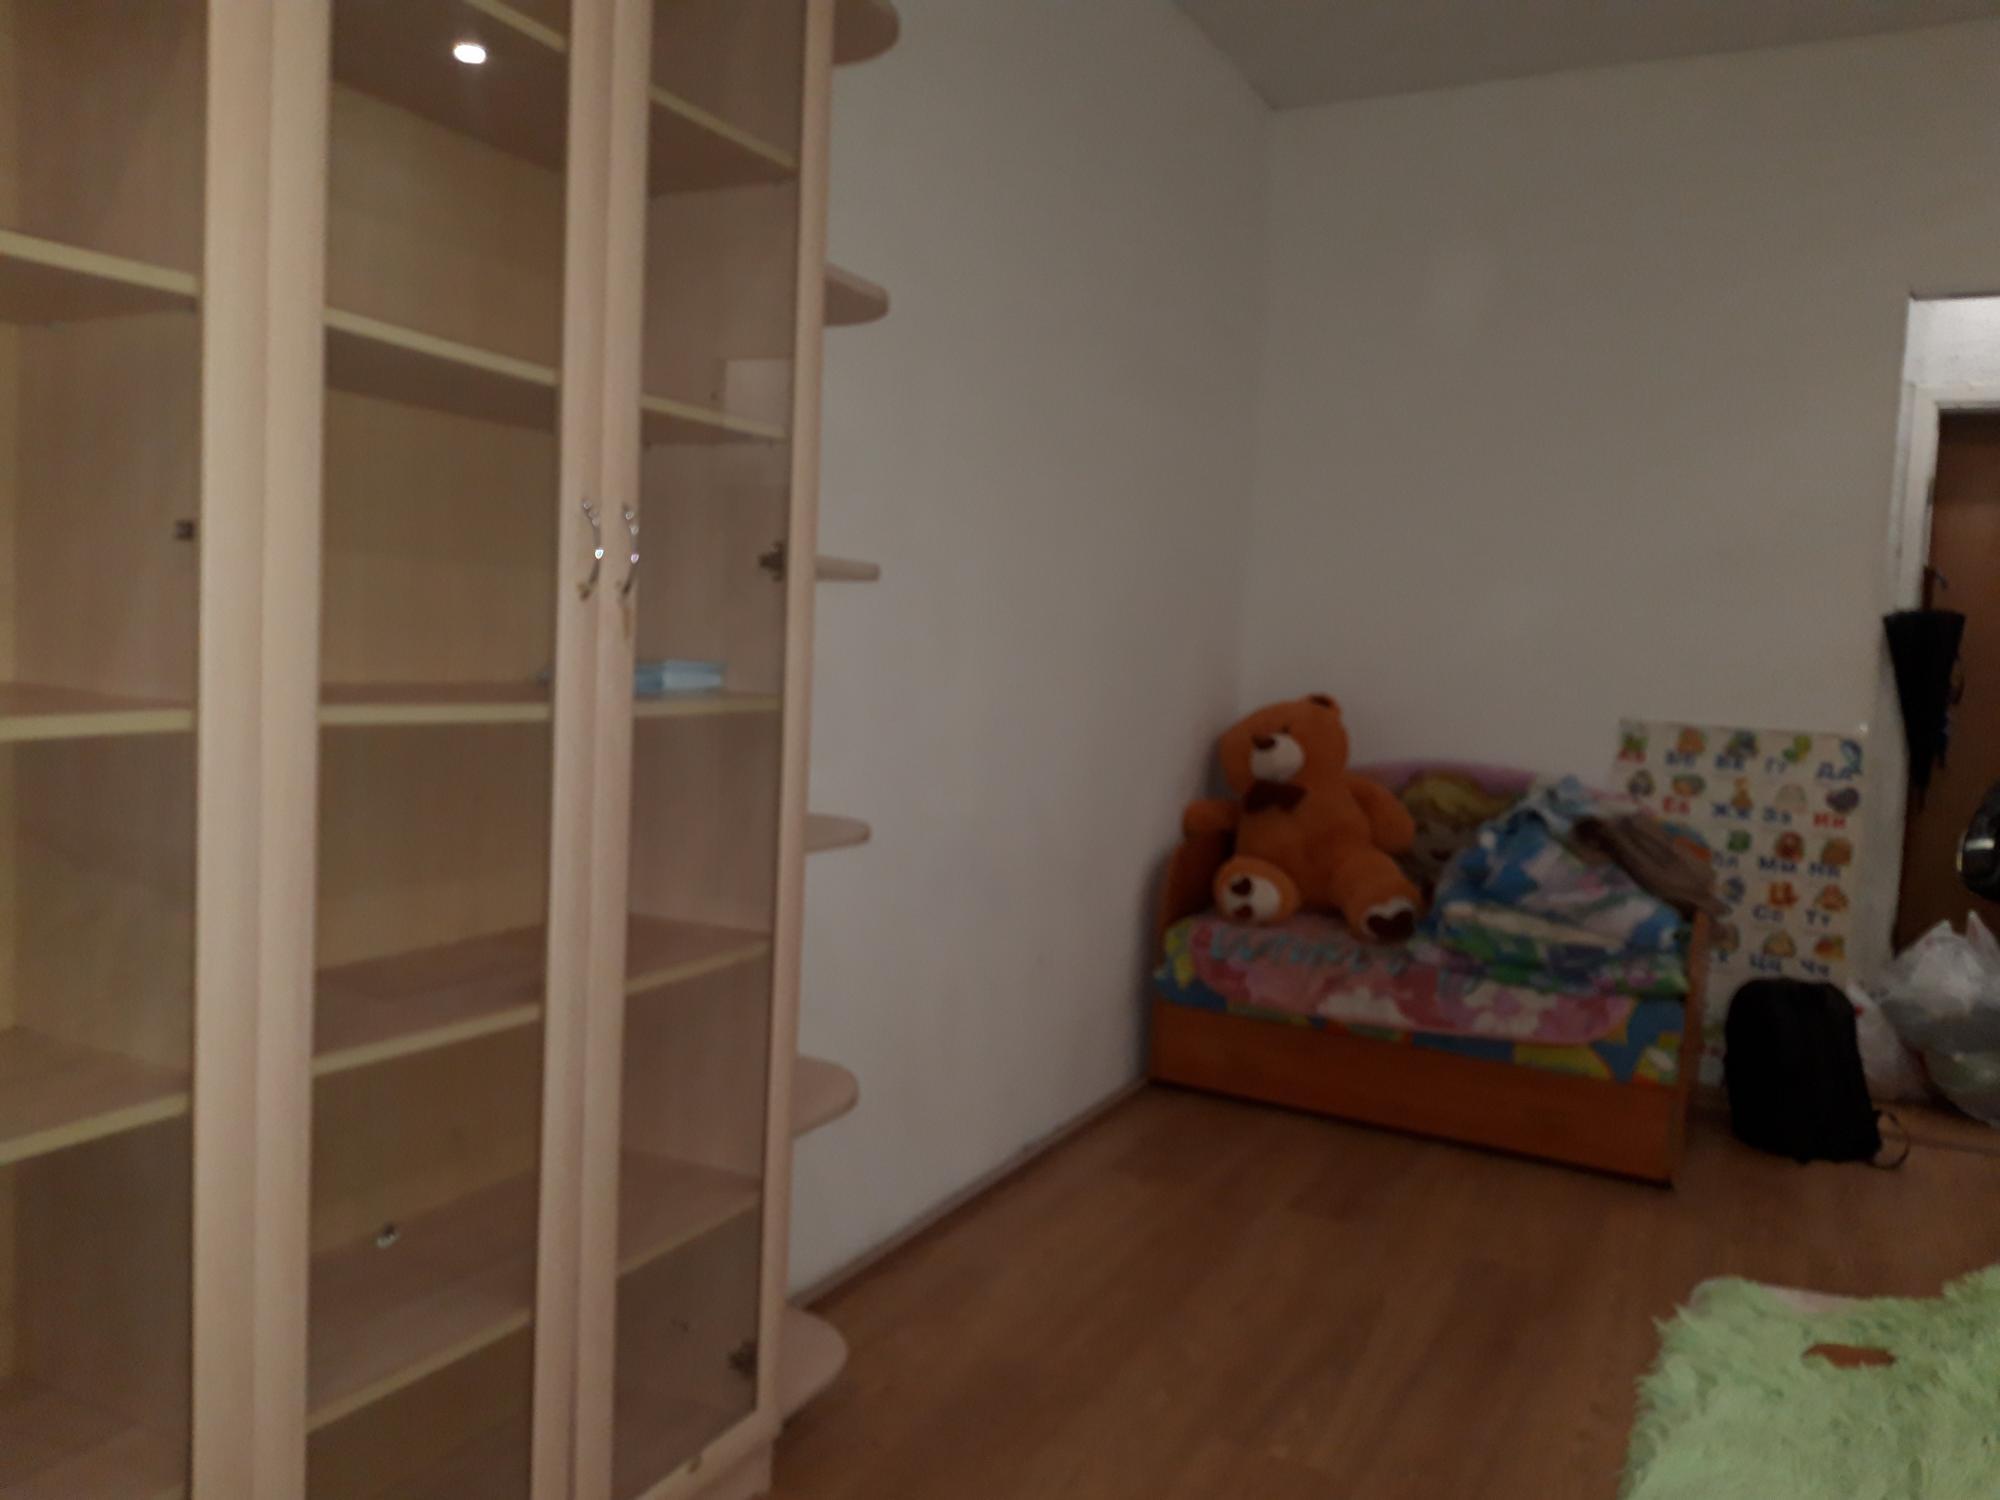 Квартира, 1 комната, 34 м² 89190284316 купить 3